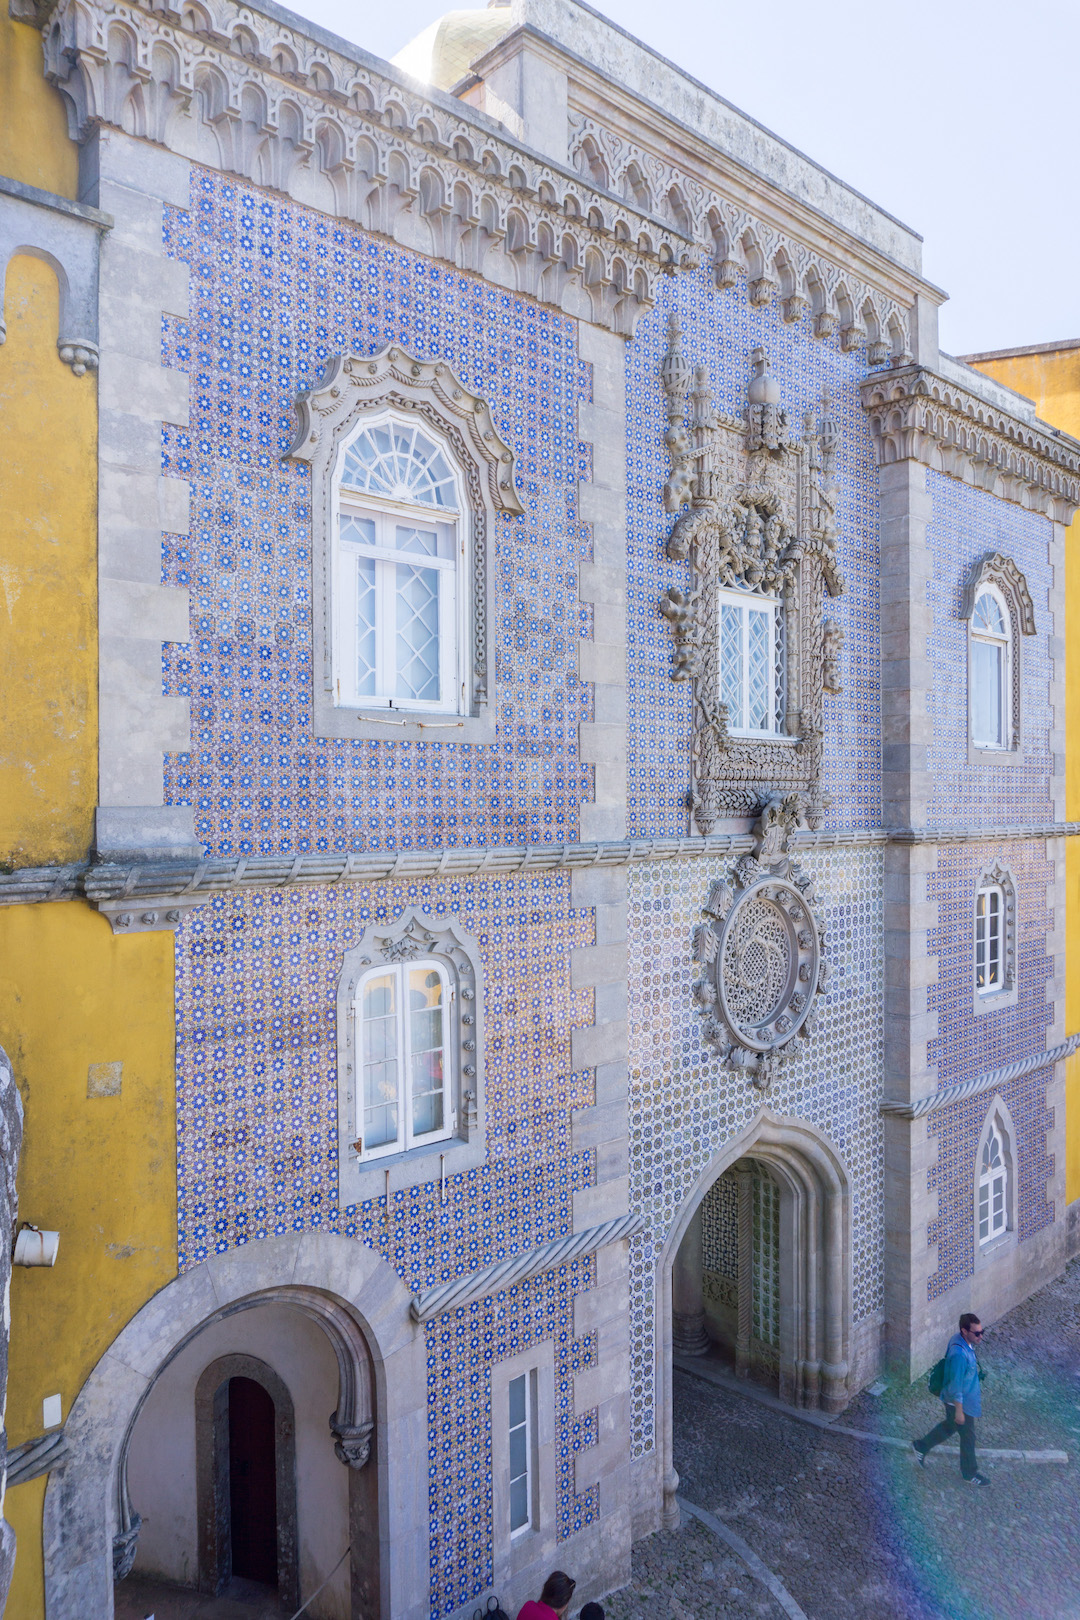 Her_Travel_Edit_Sintra_Pena_Palace_Purple_Tile